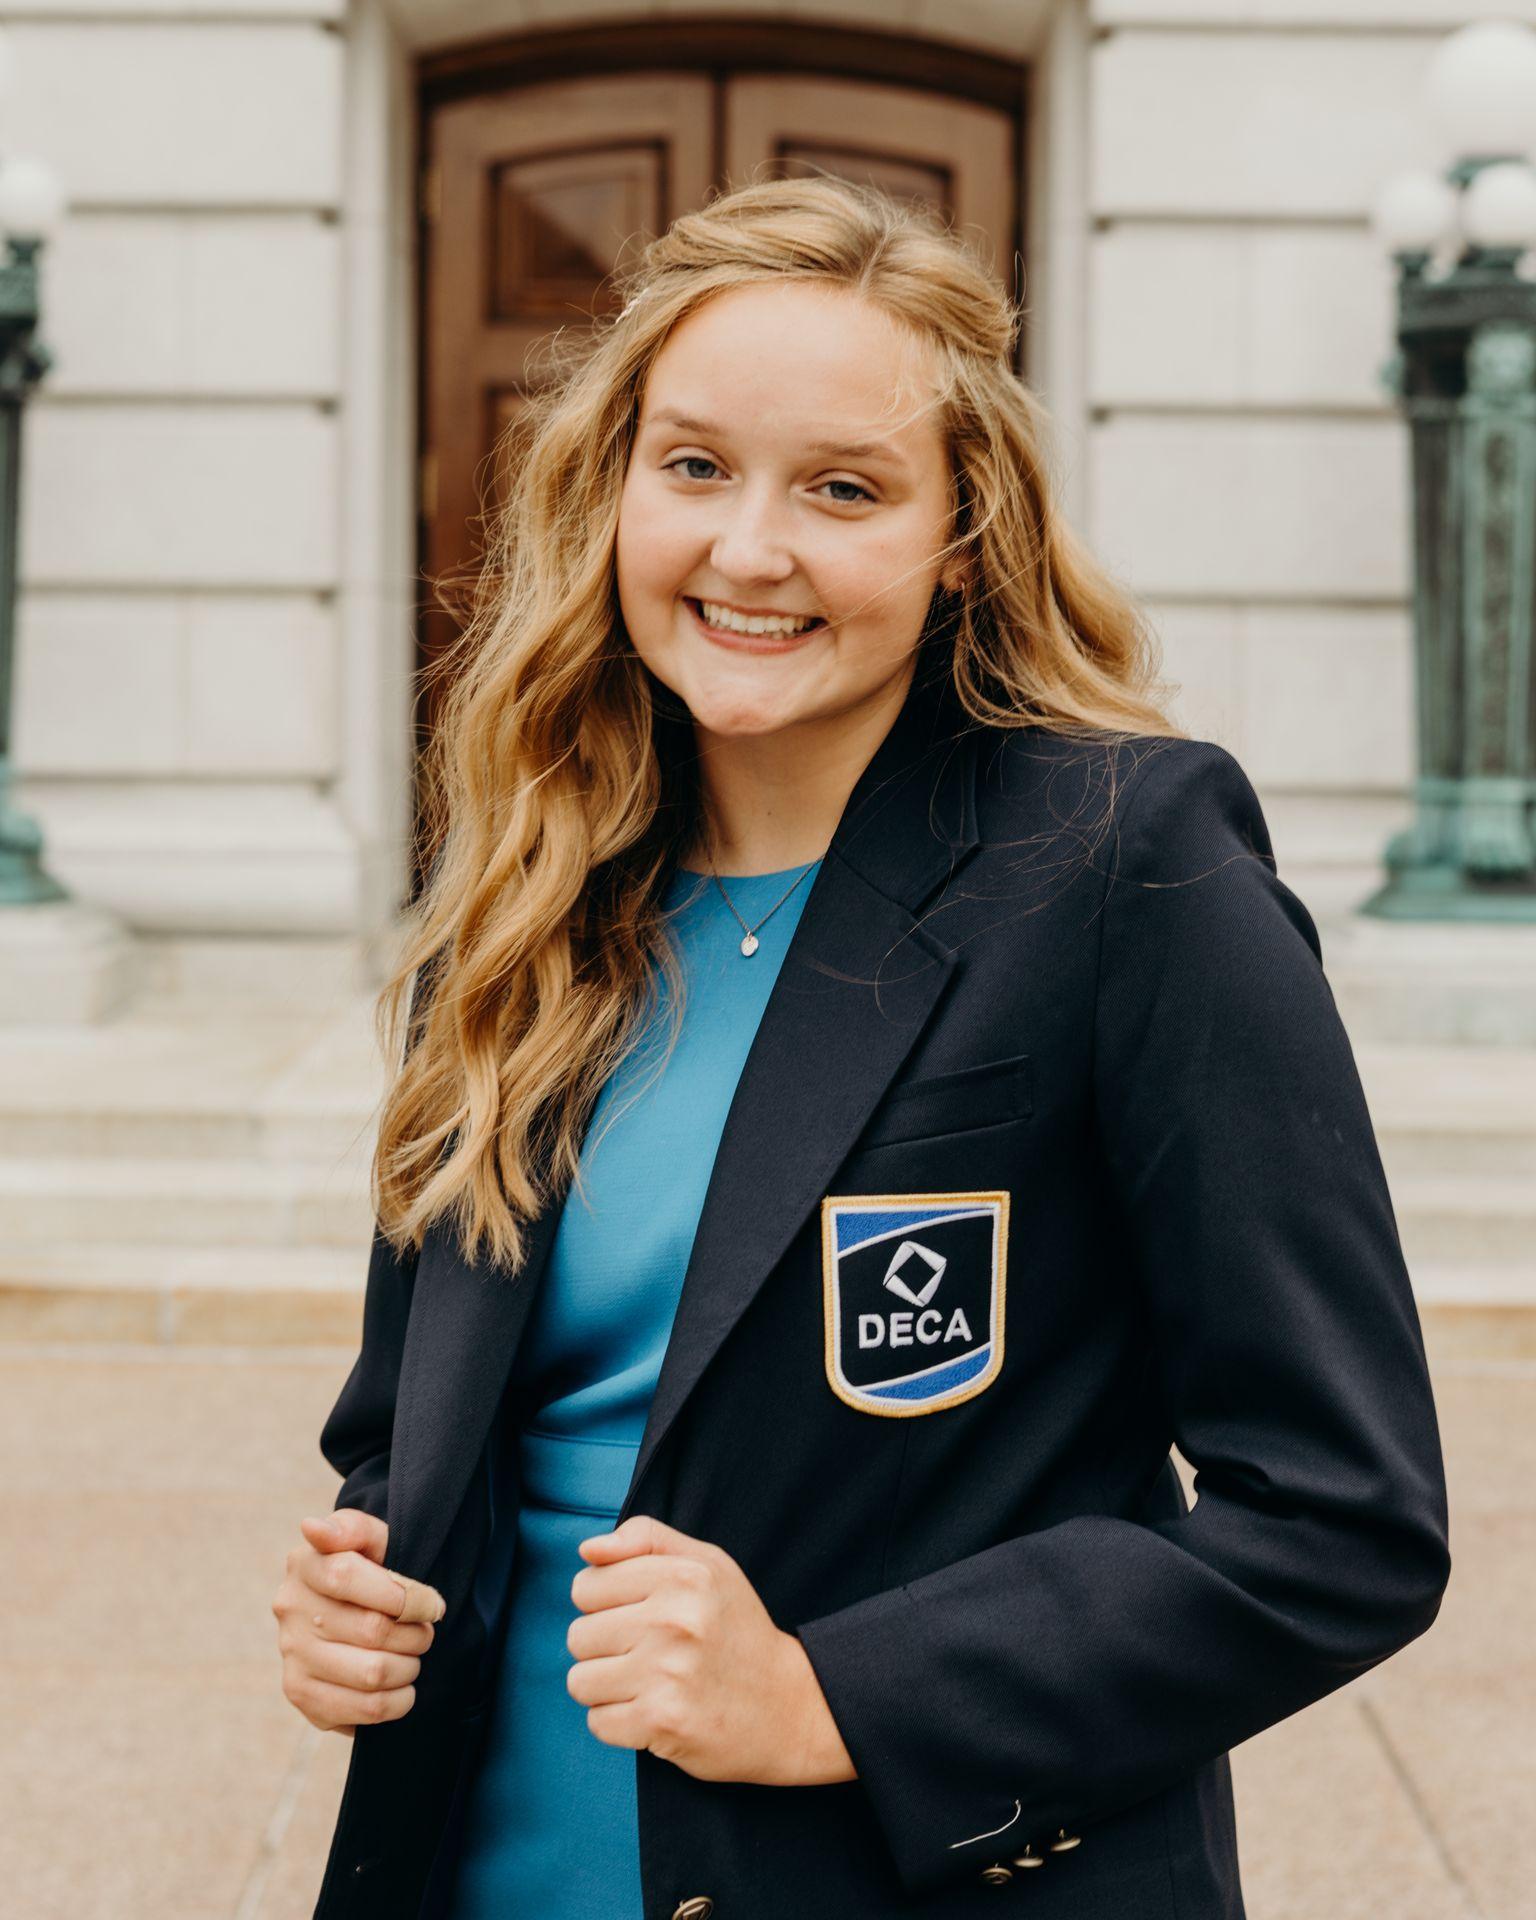 WI DECA Team 55 President Olivia Lemanski